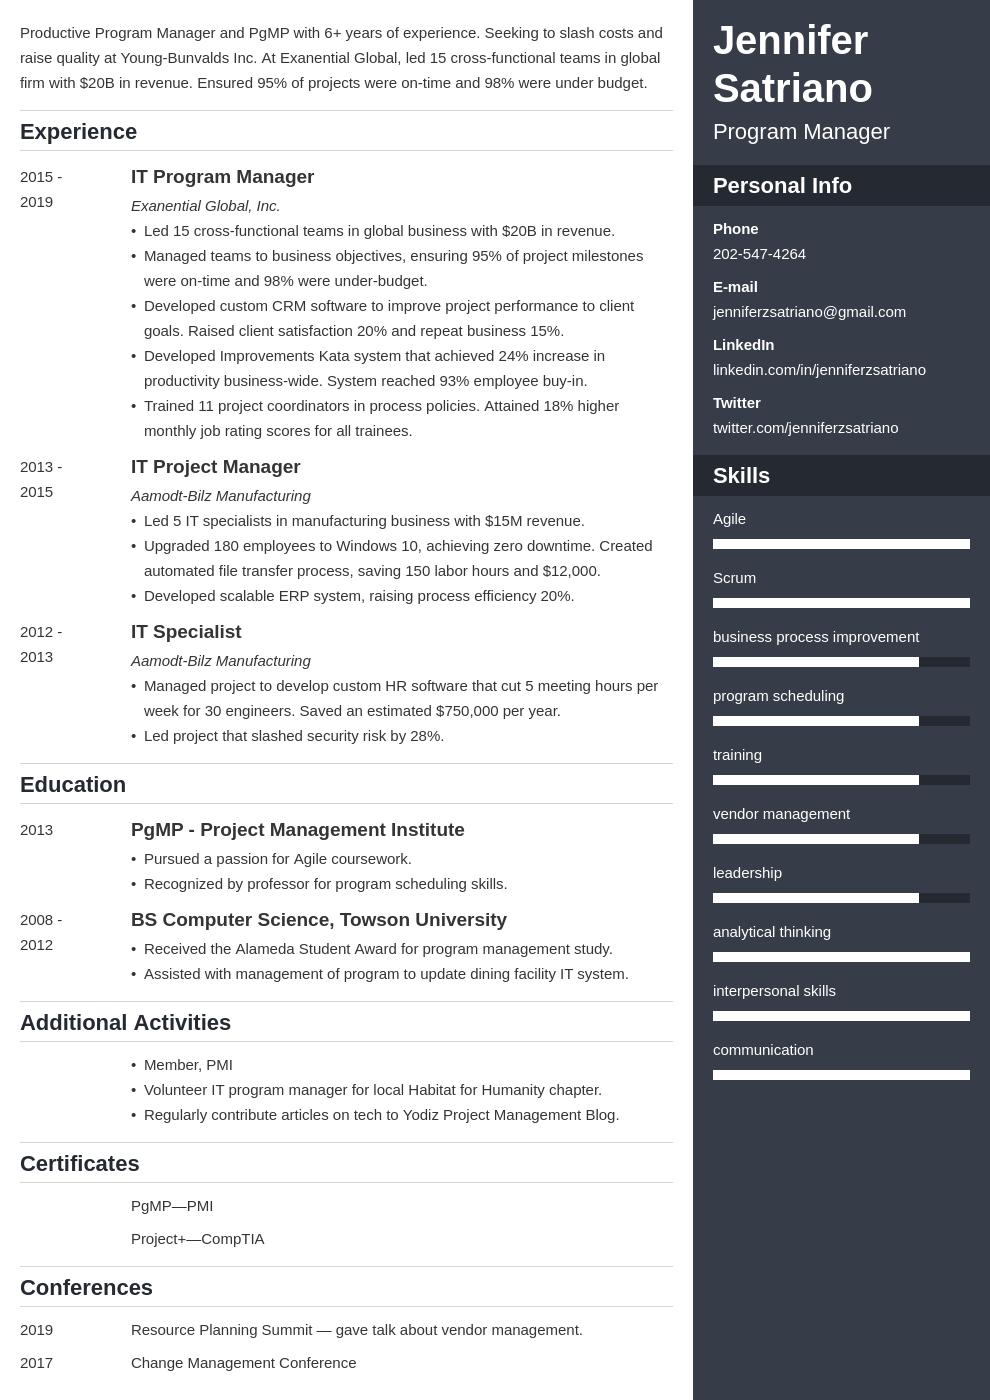 program manager template enfold uk